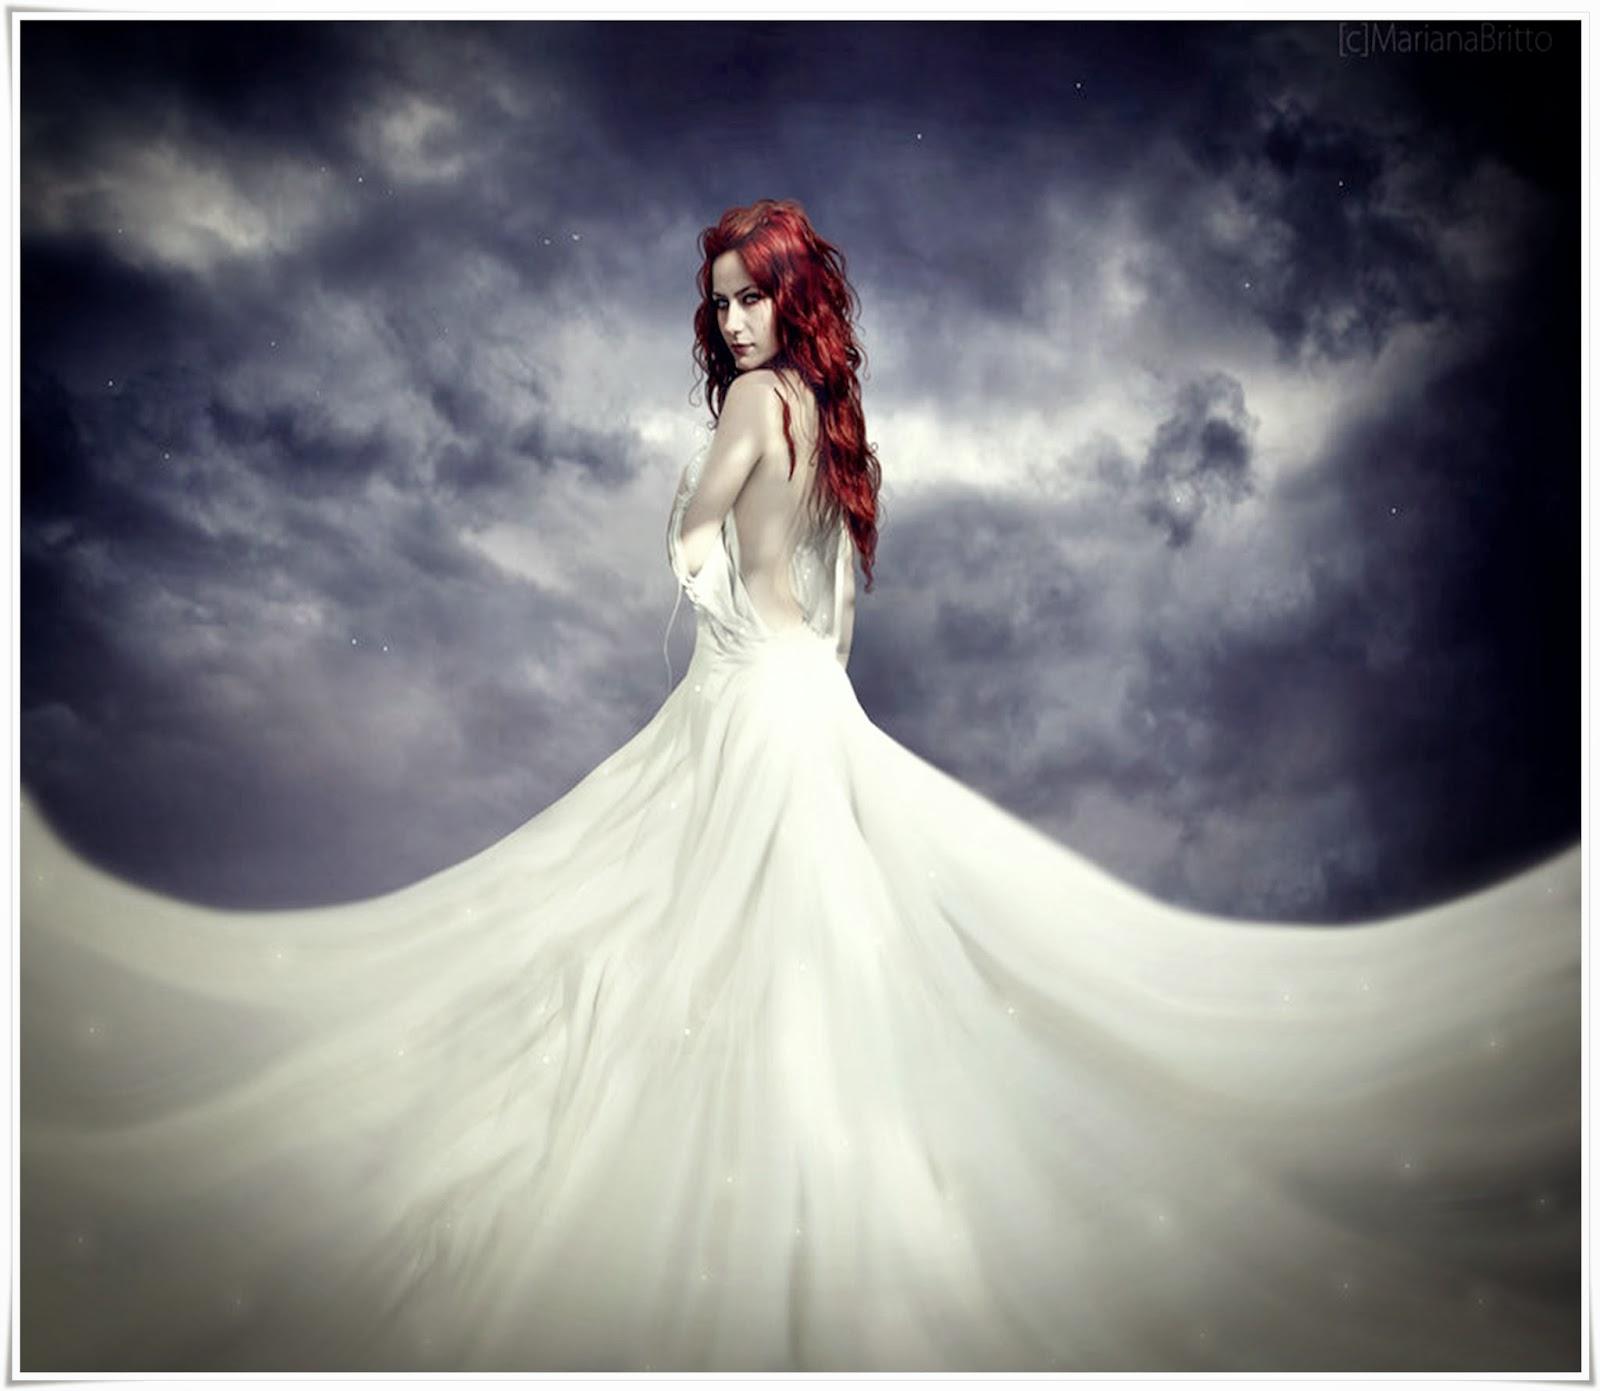 Desktop HD Wallpapers Free Downloads: Beautiful Girls